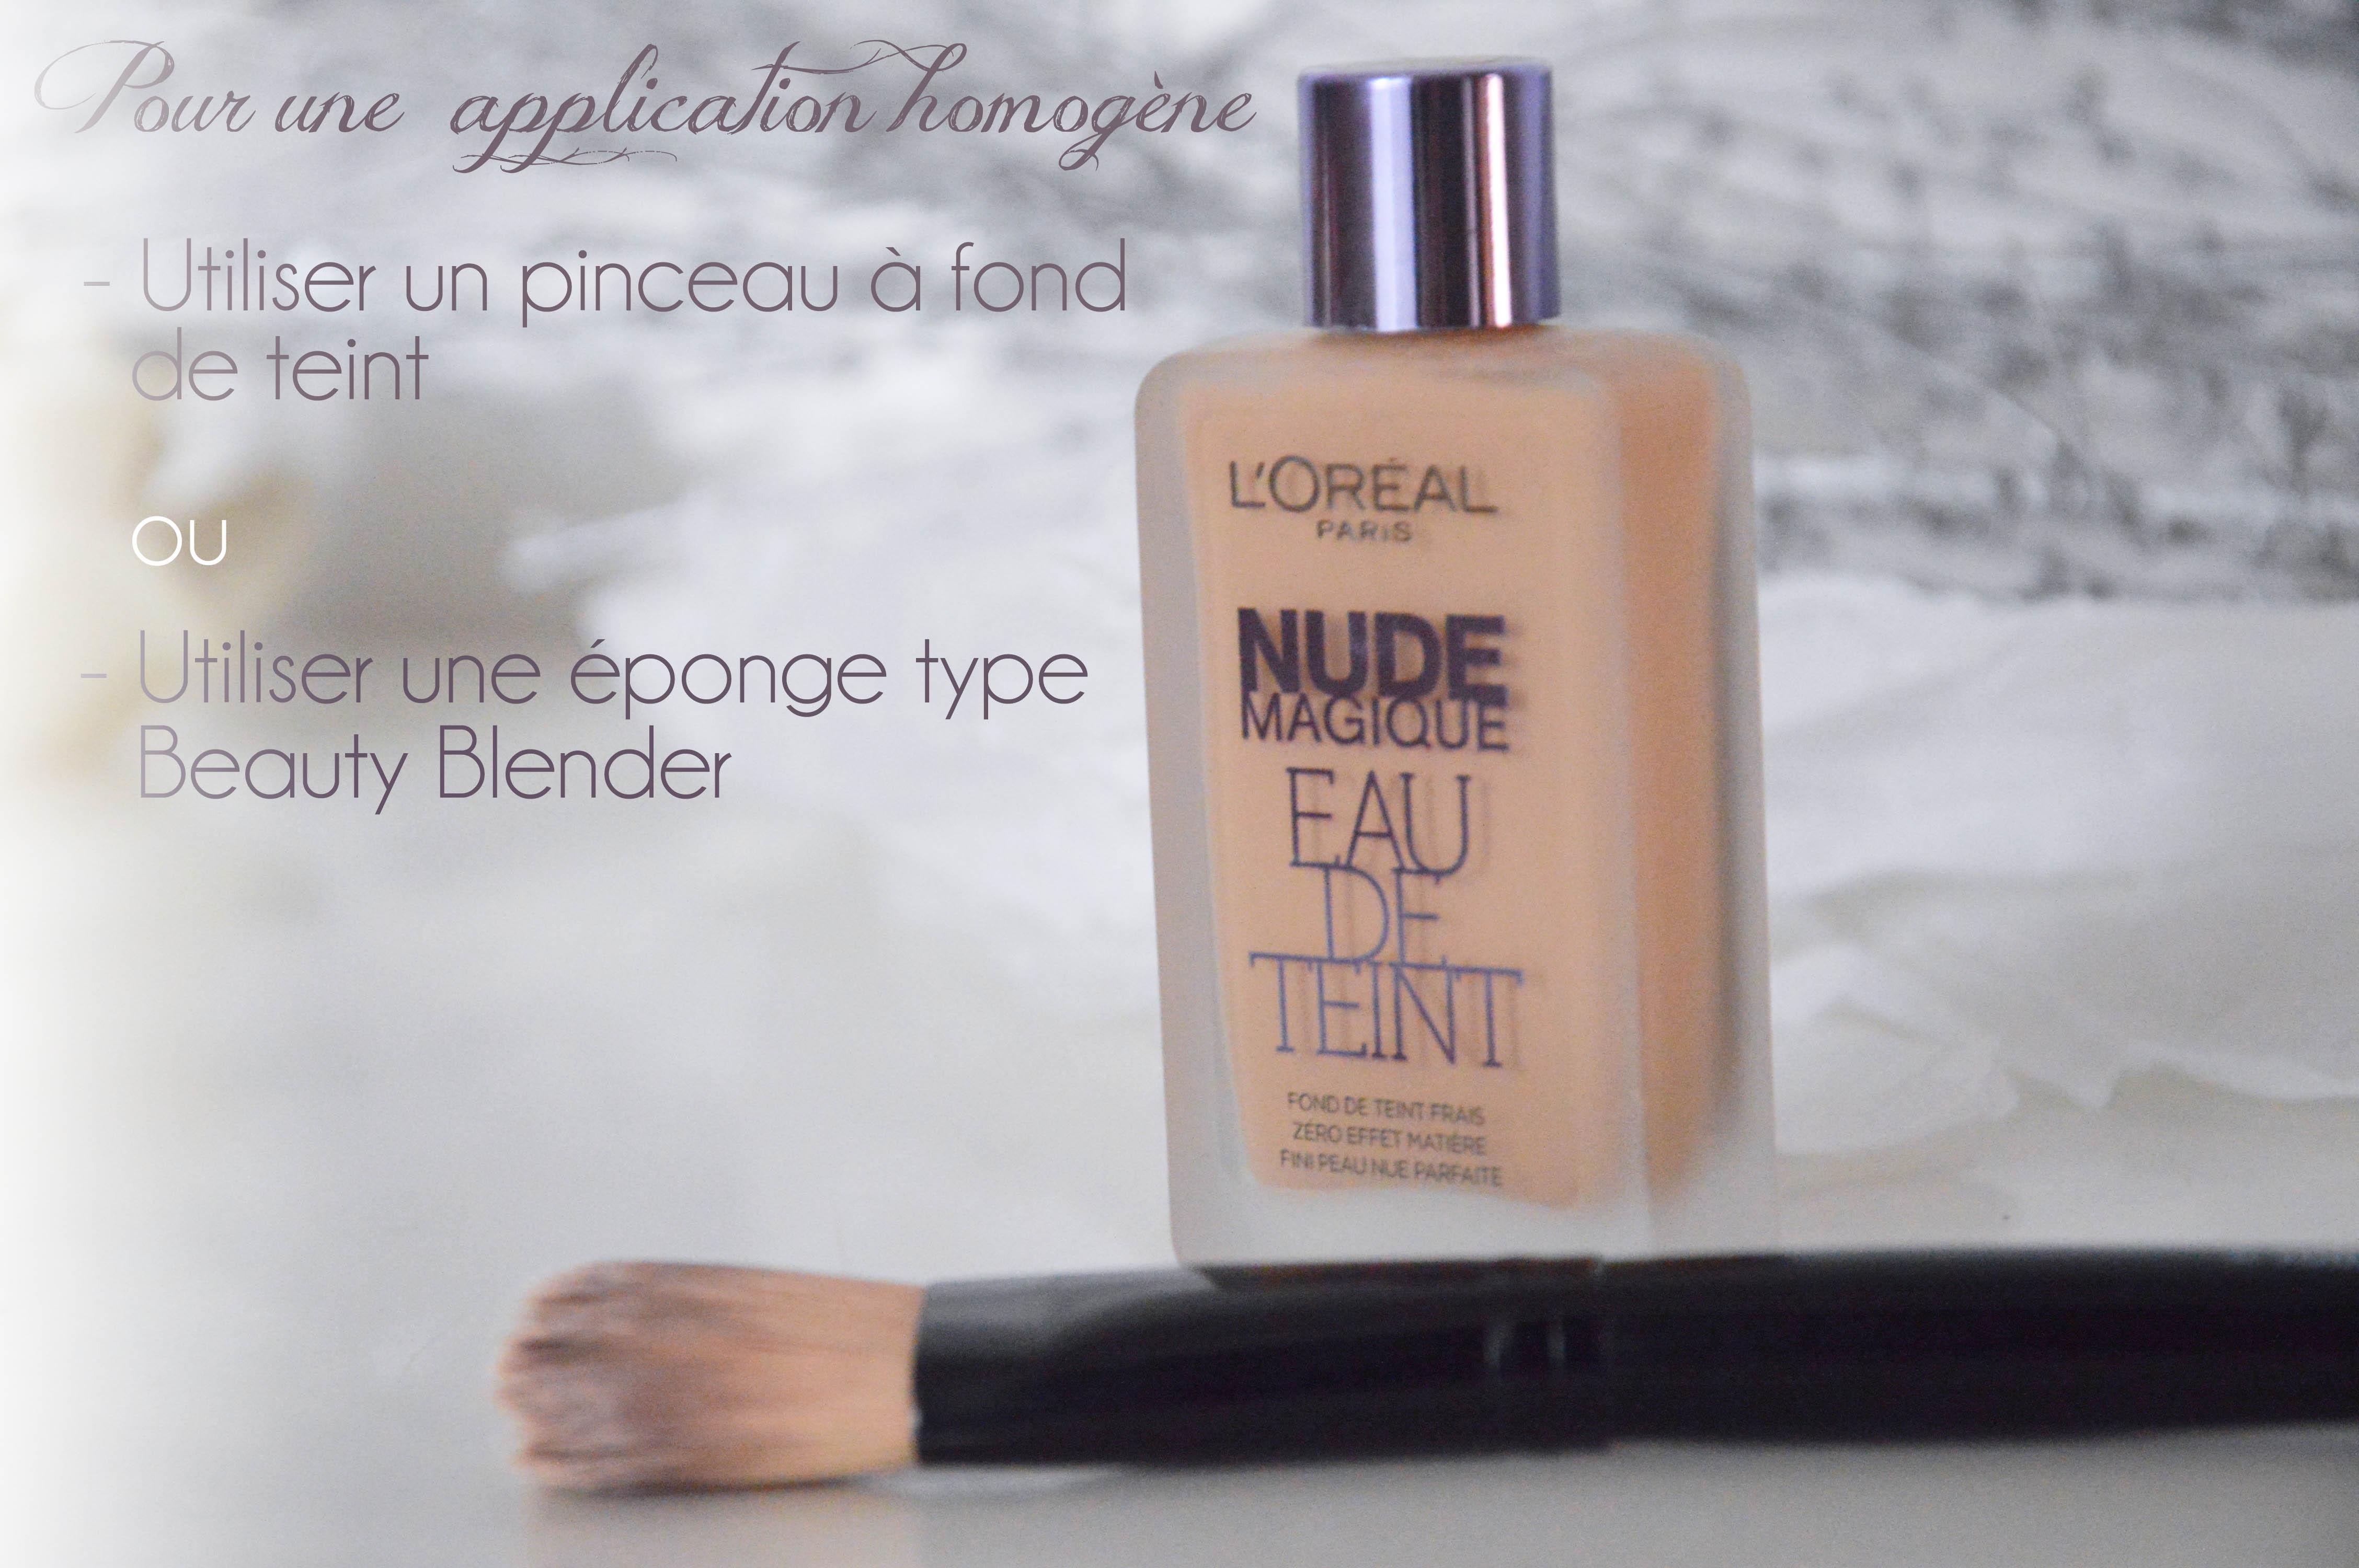 ALITTLEB_BLOG_BEAUTE_LOREAL_EAU_DE_TEINT_NUDE_MAGIQUE_application